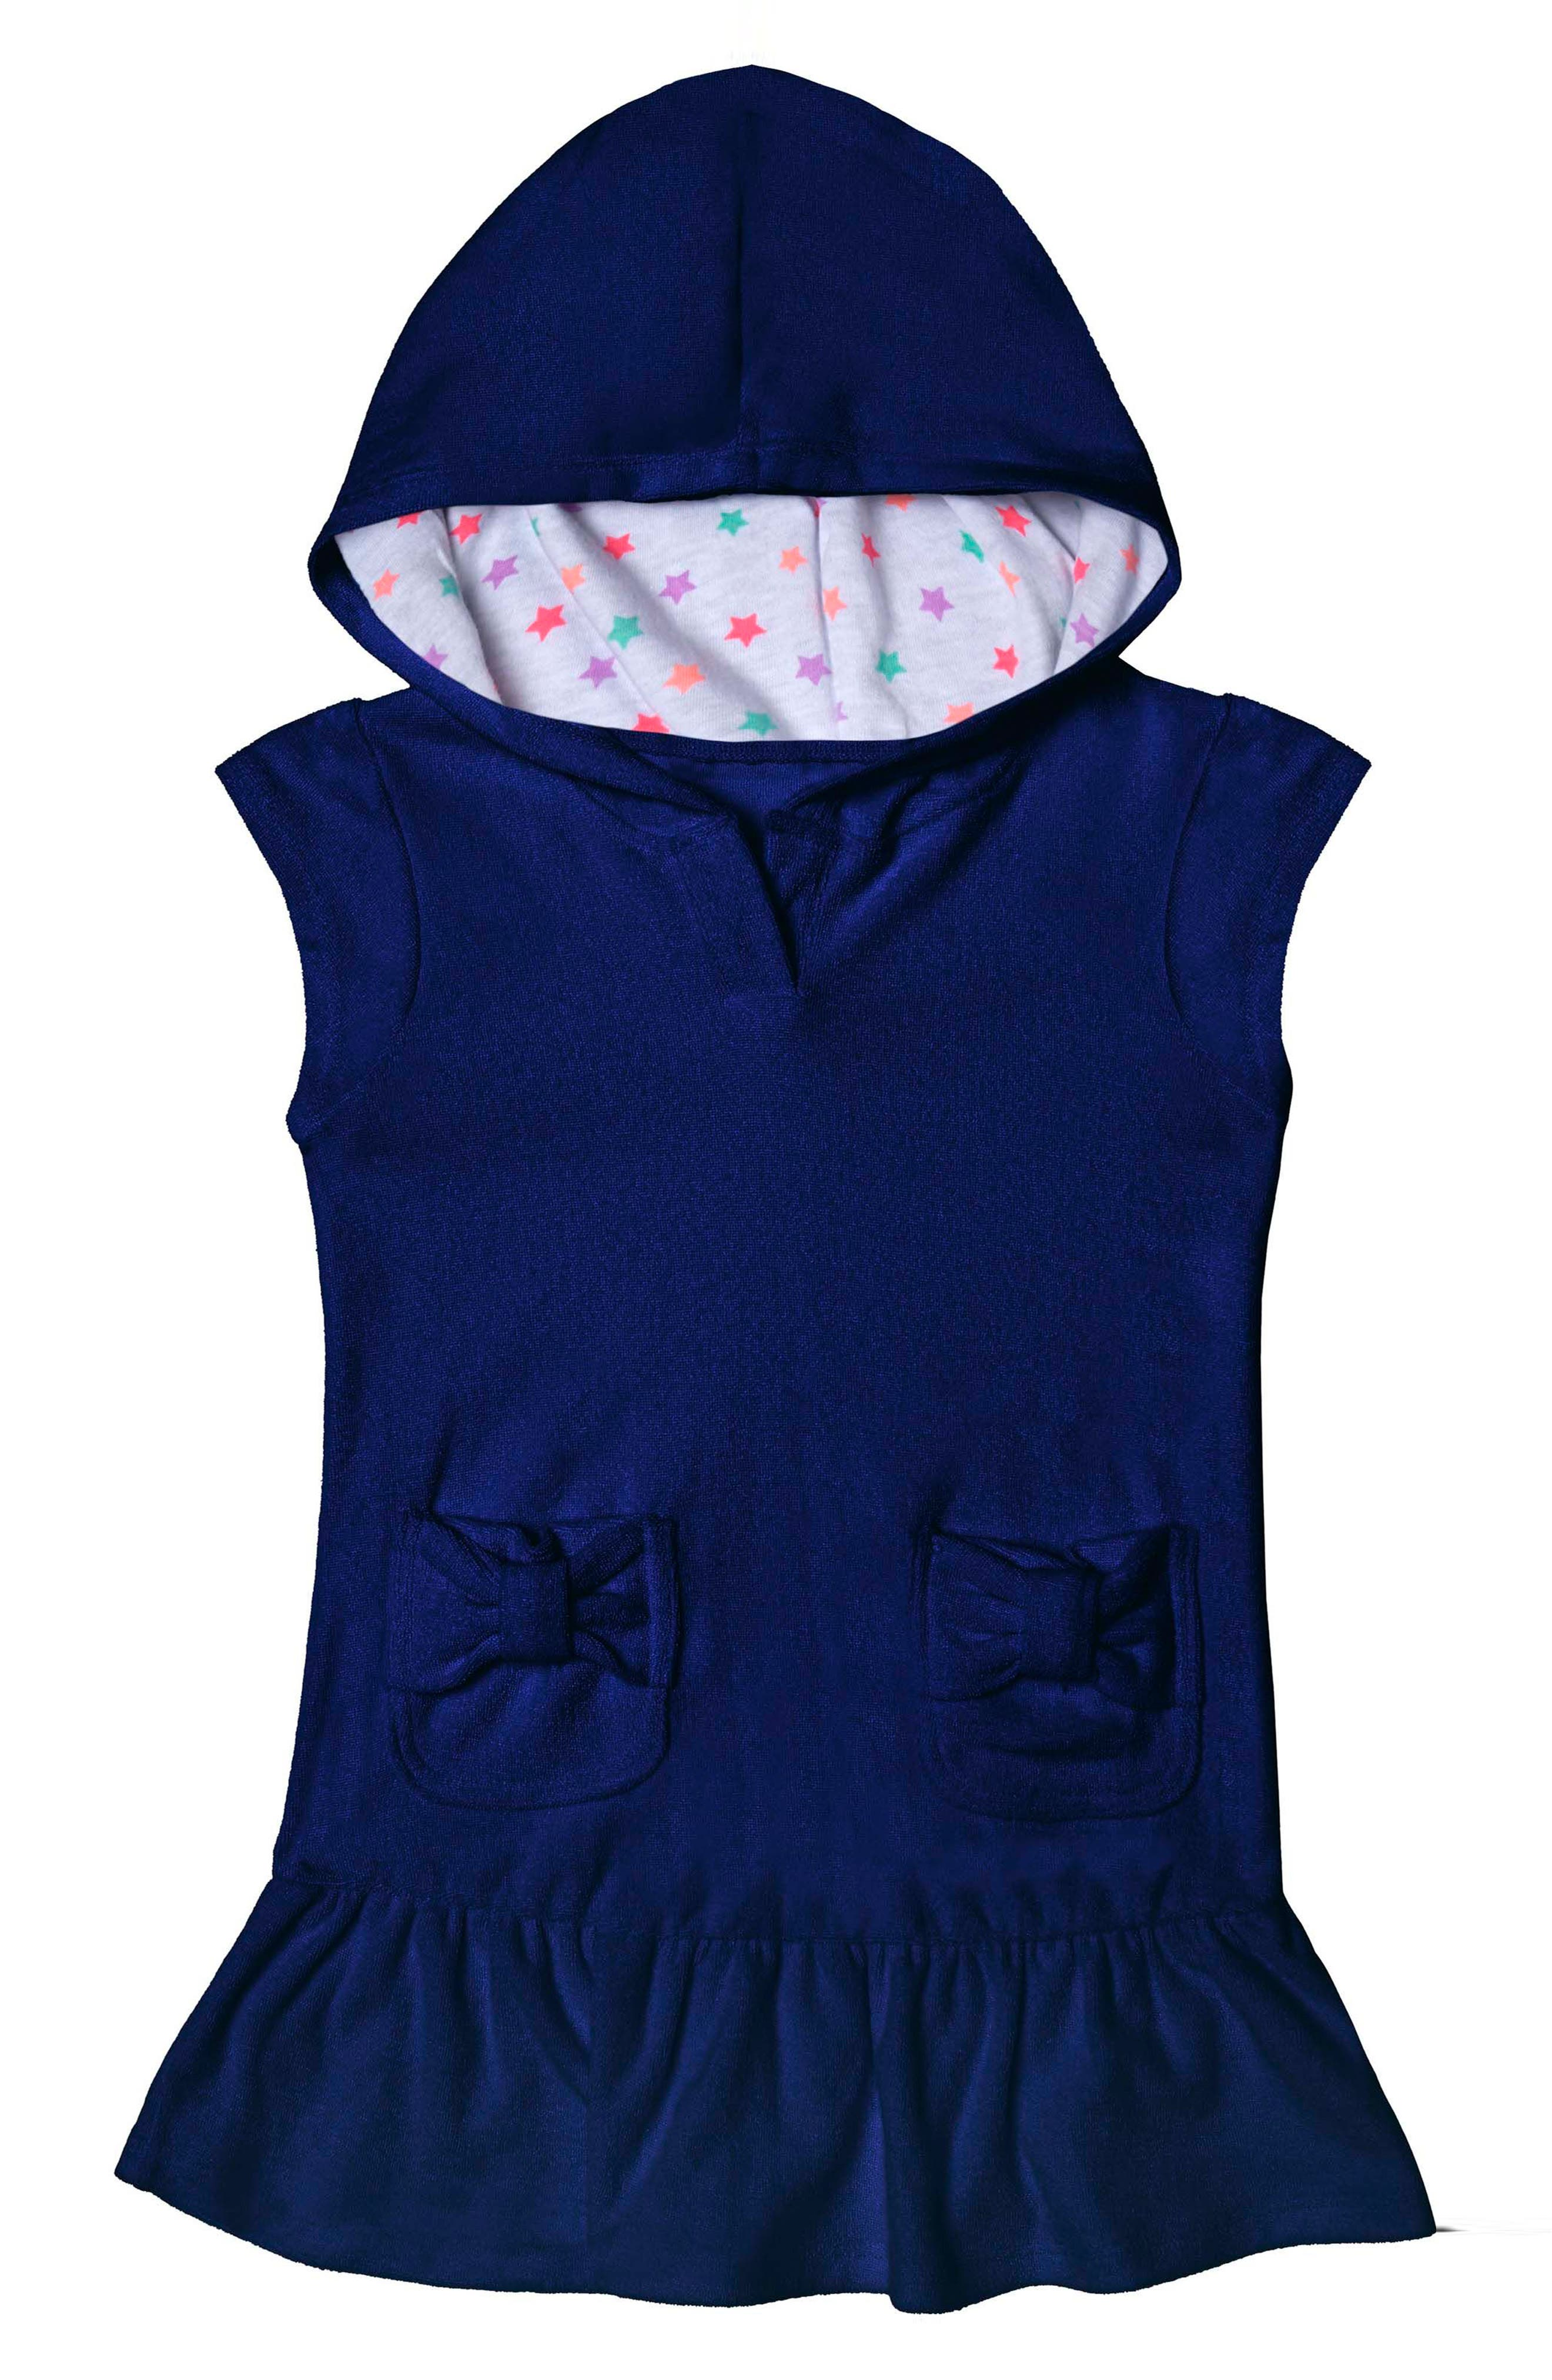 Main Image - Hula Star Cotton Cloud Hooded Cover-Up Dress (Toddler Girls & Little Girls)